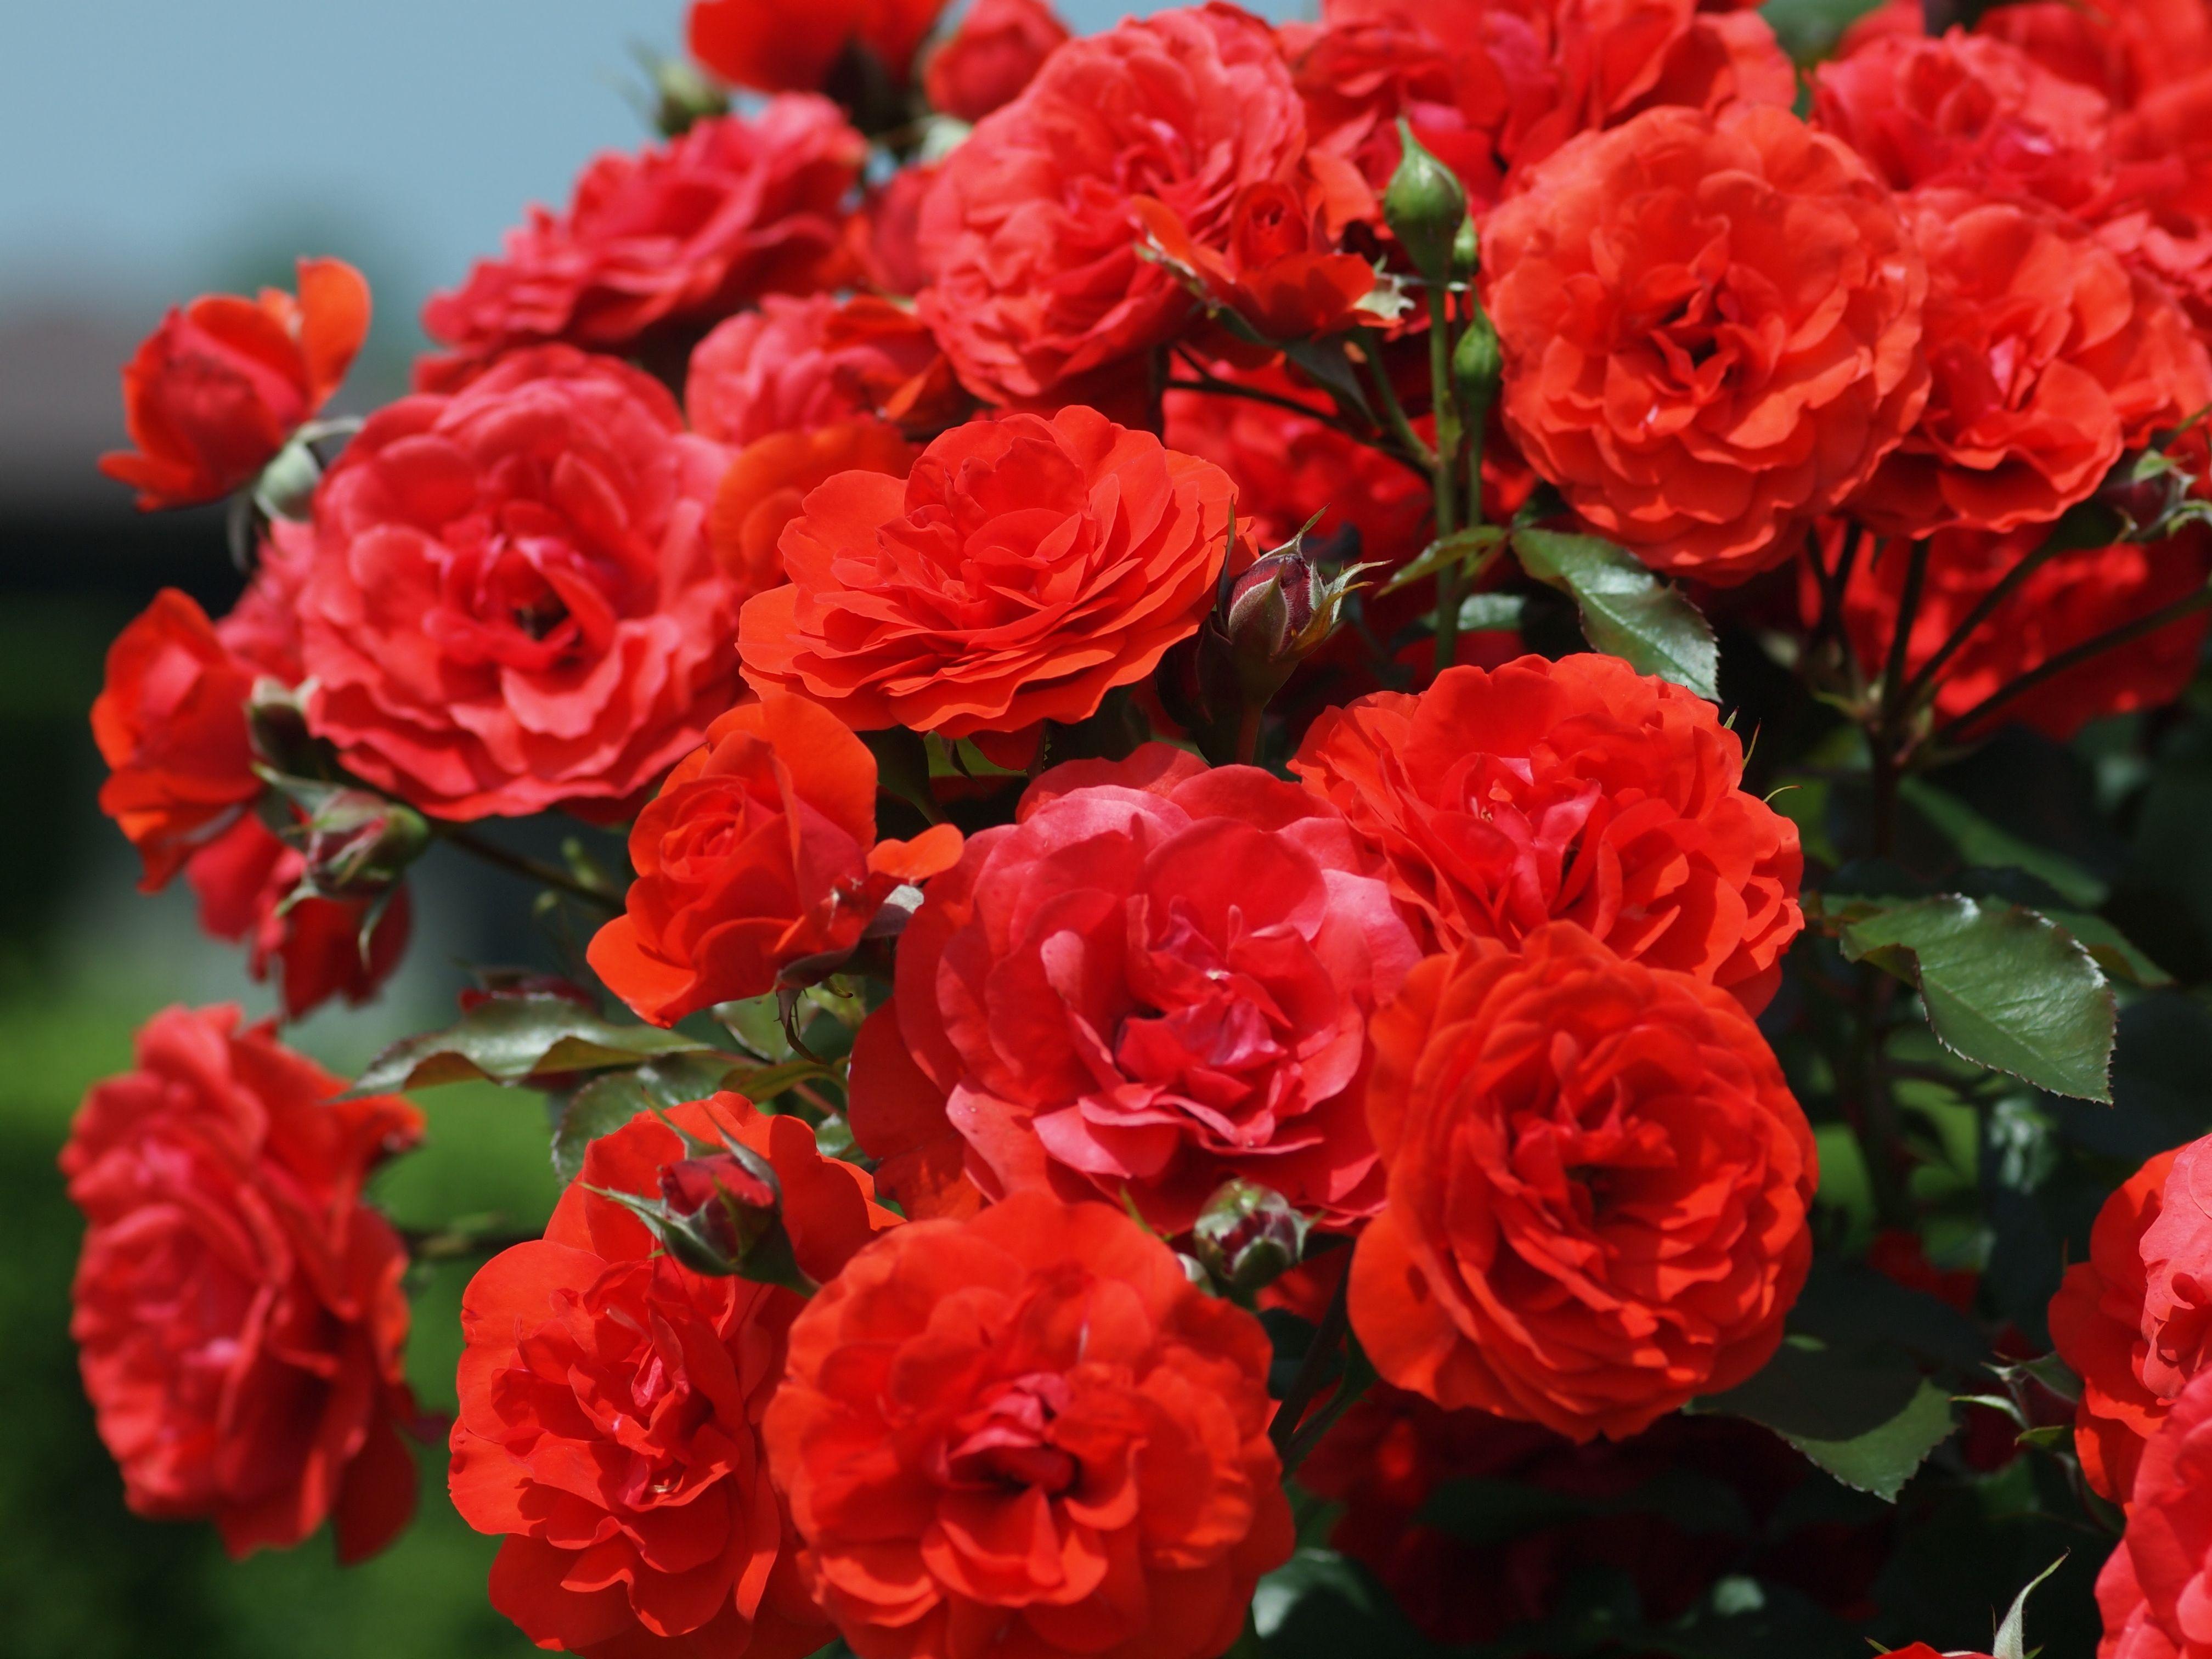 Rose Pruning For Sacramento Gardeners